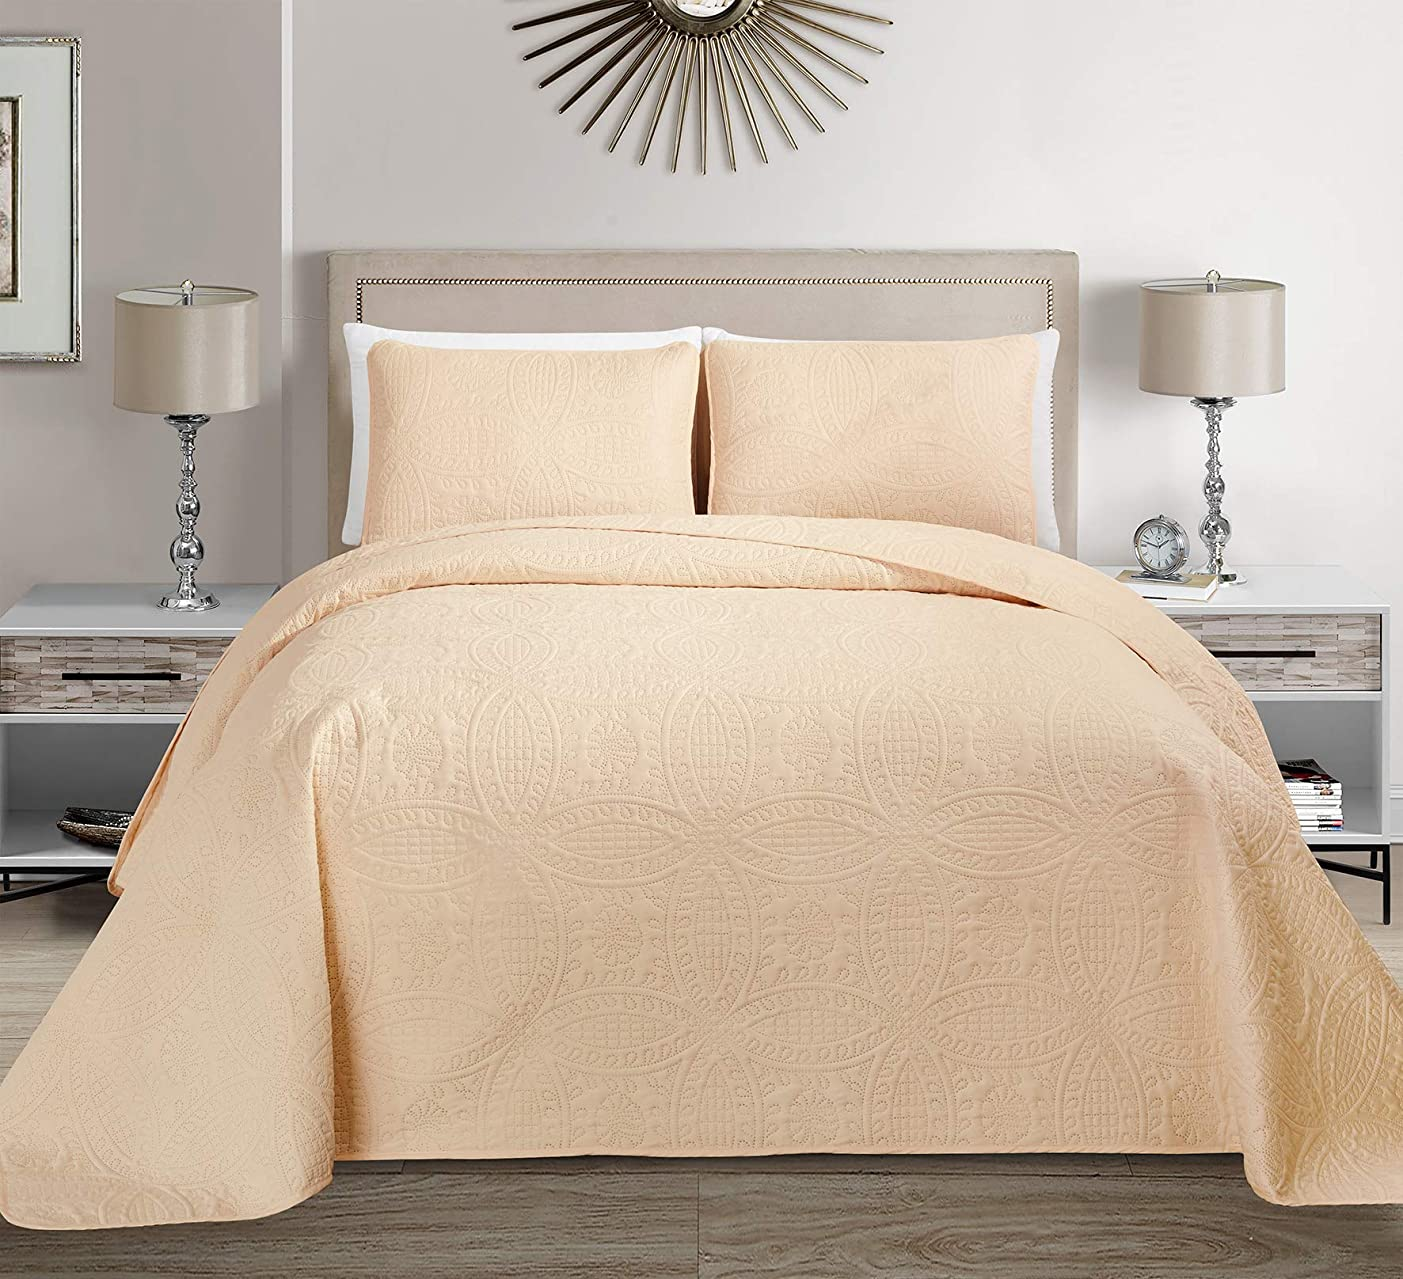 Linen Plus フル/クイーン 3点 オーバーサイズ エンボス加工 ベッドスプレッドセット アイボリー